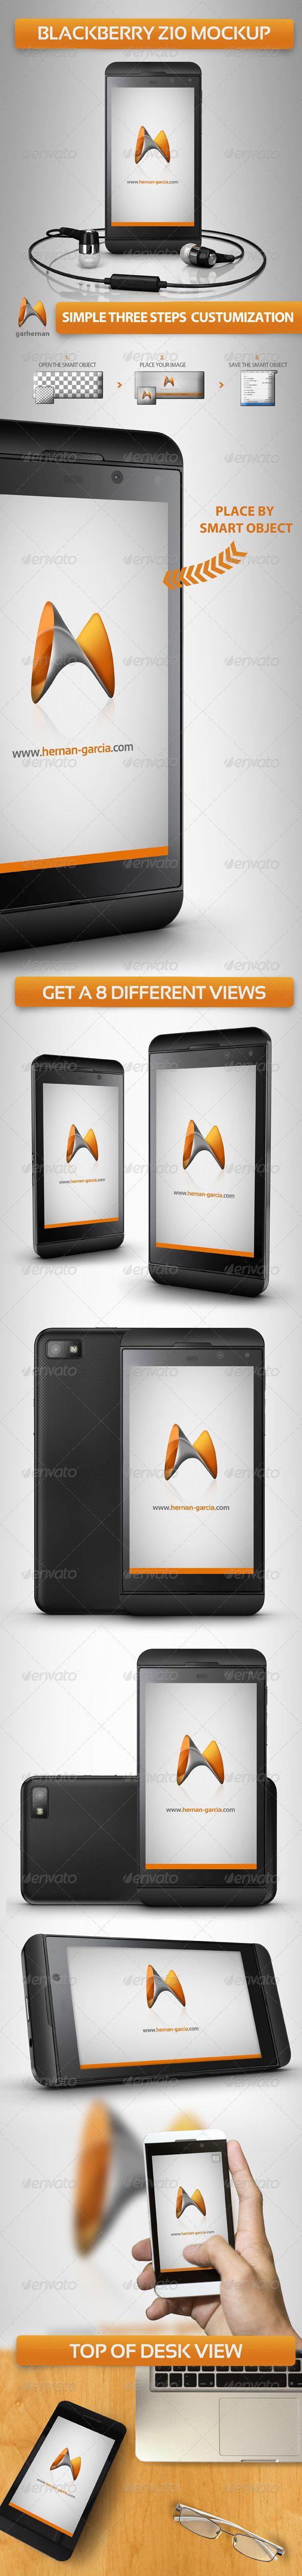 Blackberry Z10 MockUps — Photoshop PSD #showcase #app • Available here → https://graphicriver.net/item/blackberry-z10-mockups/4639399?ref=pxcr